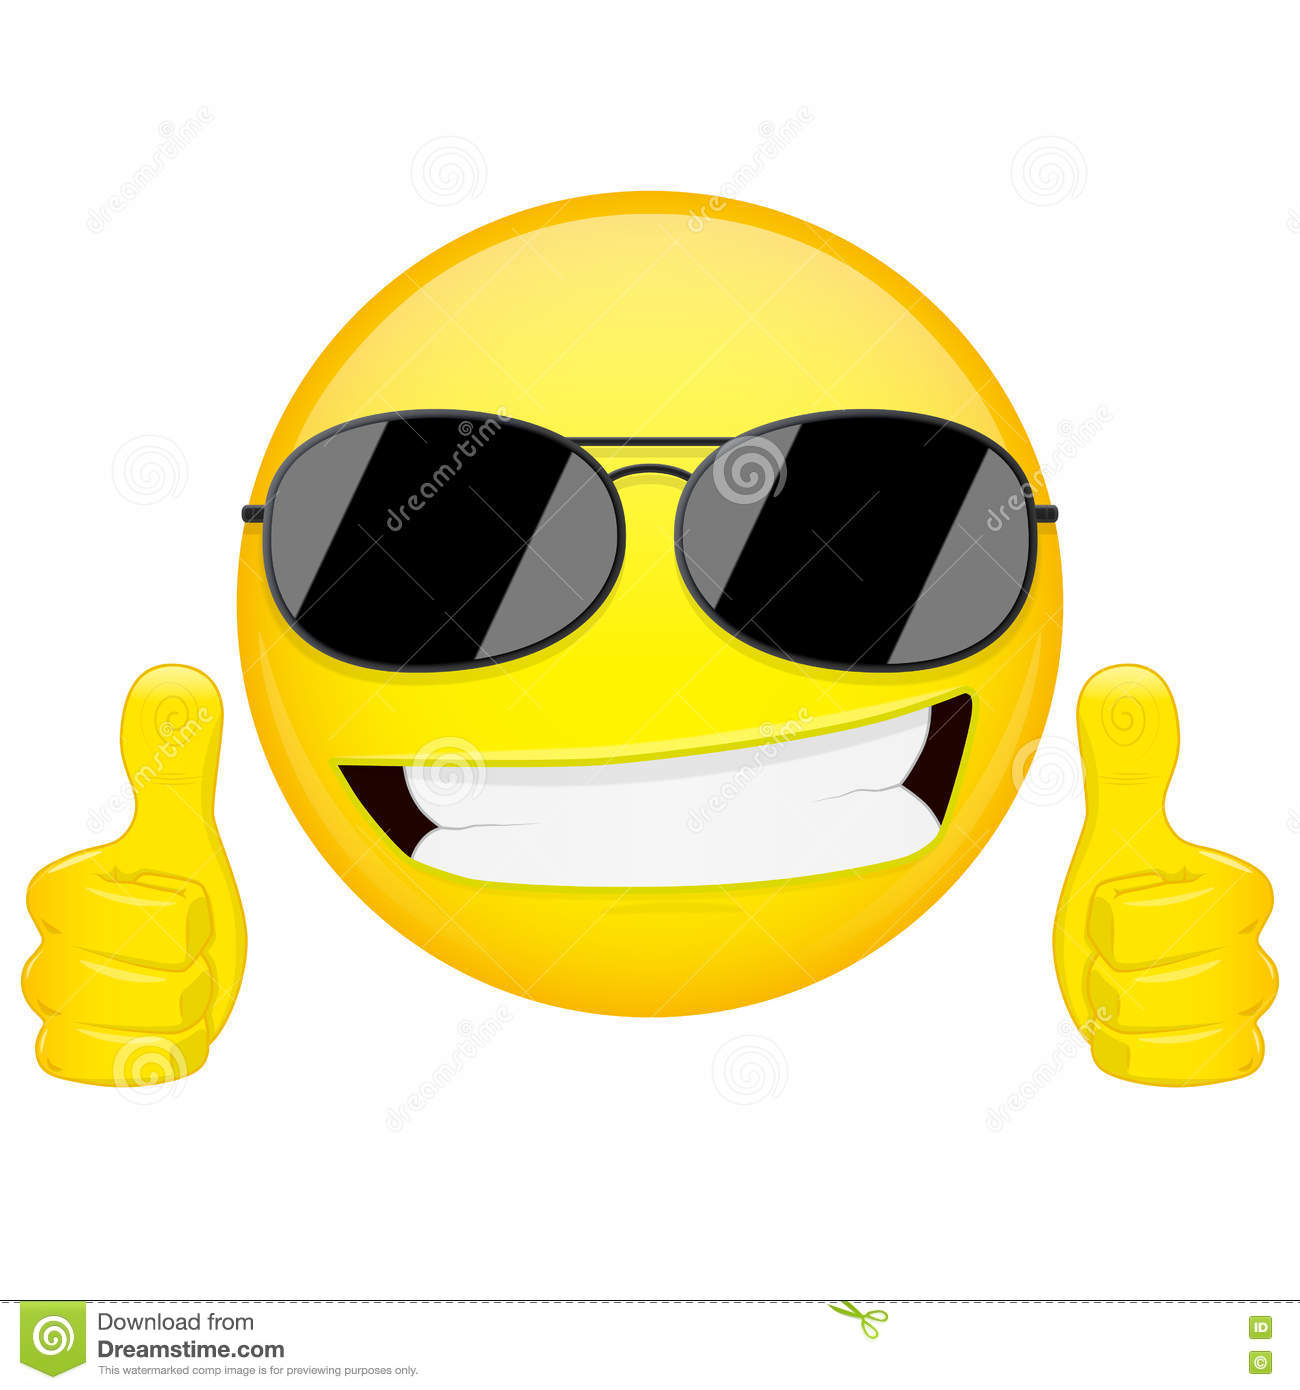 Thumbs up emoji image royalty free download Thumbs Up Emoticon Emoji Stock Vector - Image: 57859992 image royalty free download